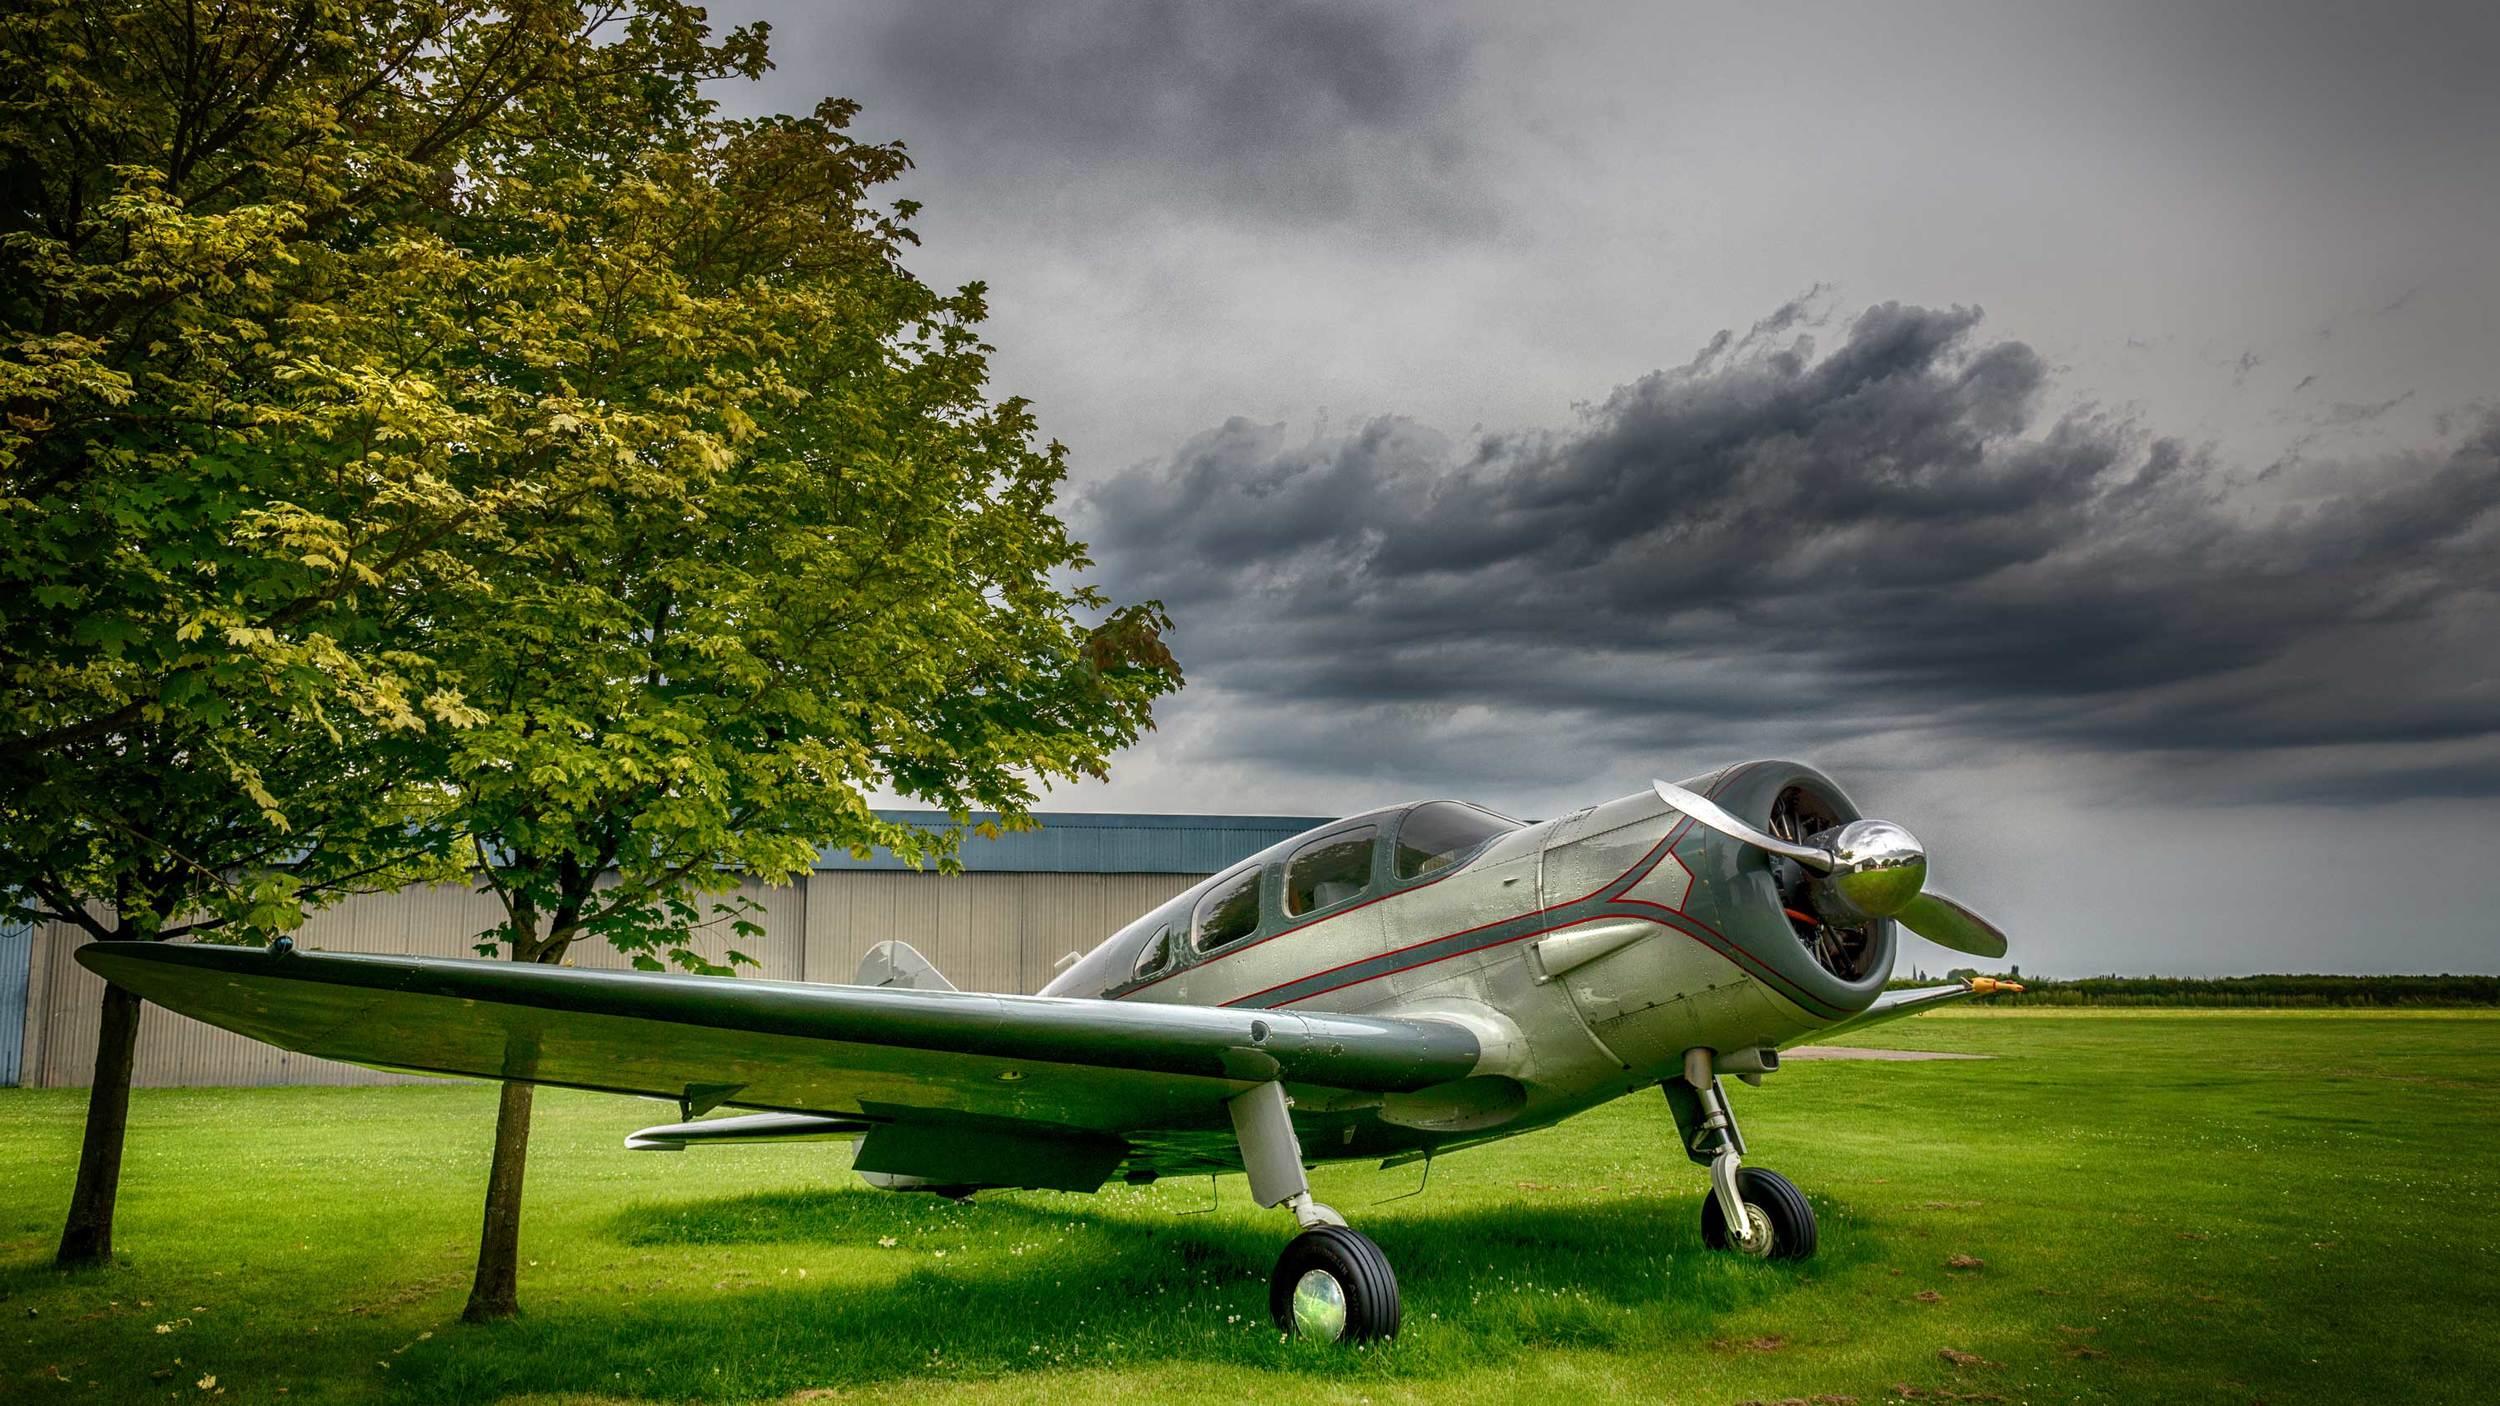 Rainy Cloudy Rain Plane WEB Color.jpg